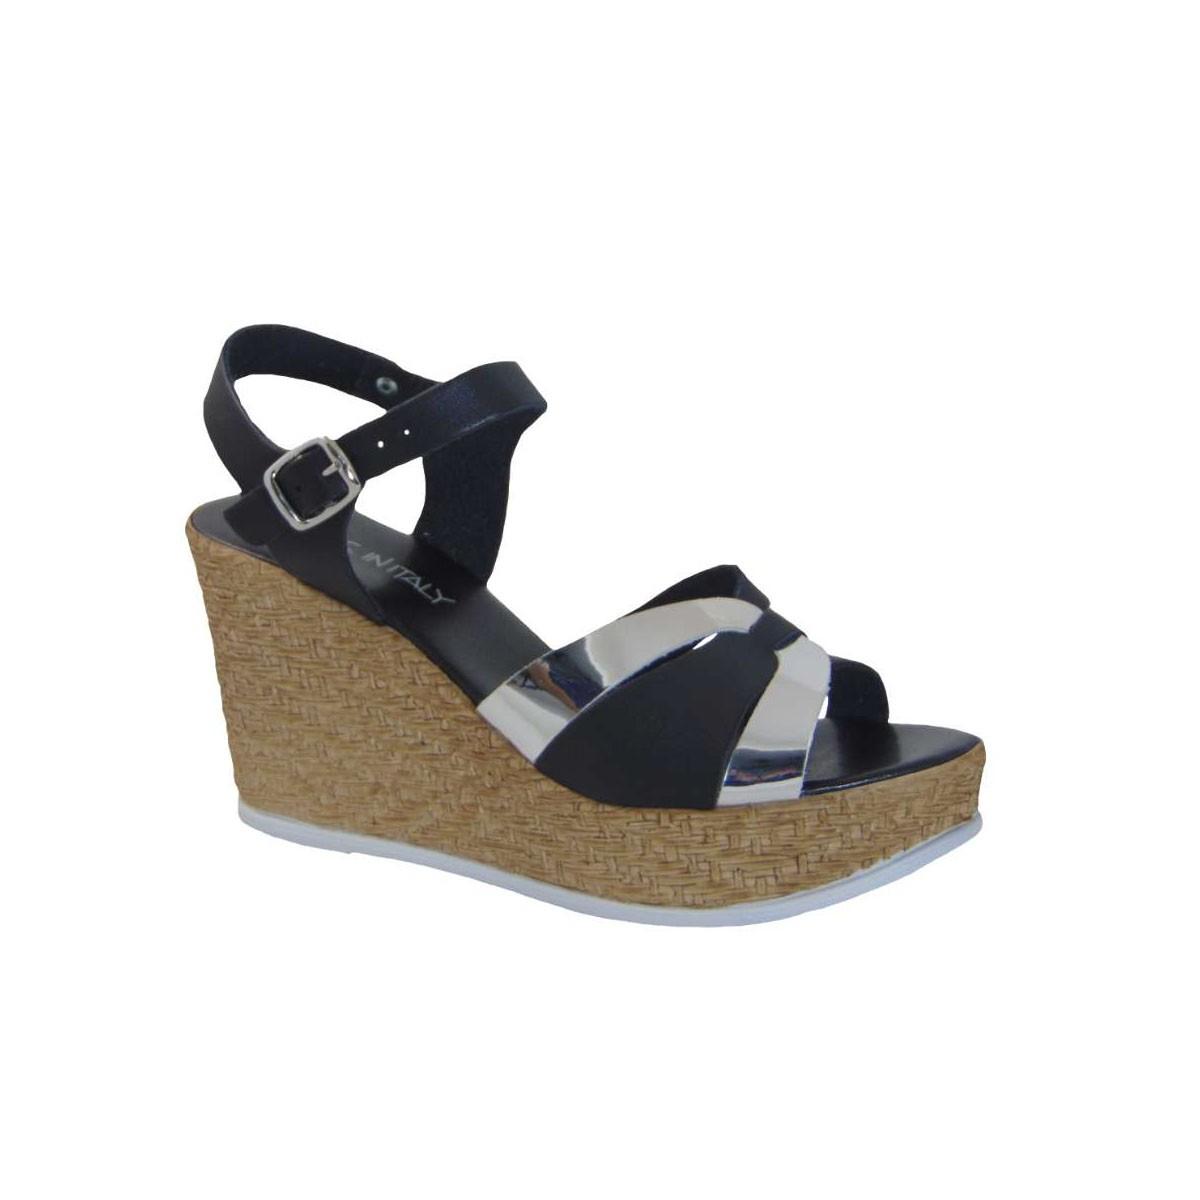 Tsimpolis Shoes 004LZ-2 Πλατφόρμα Από Τεχνοδέρμα Μαύρη